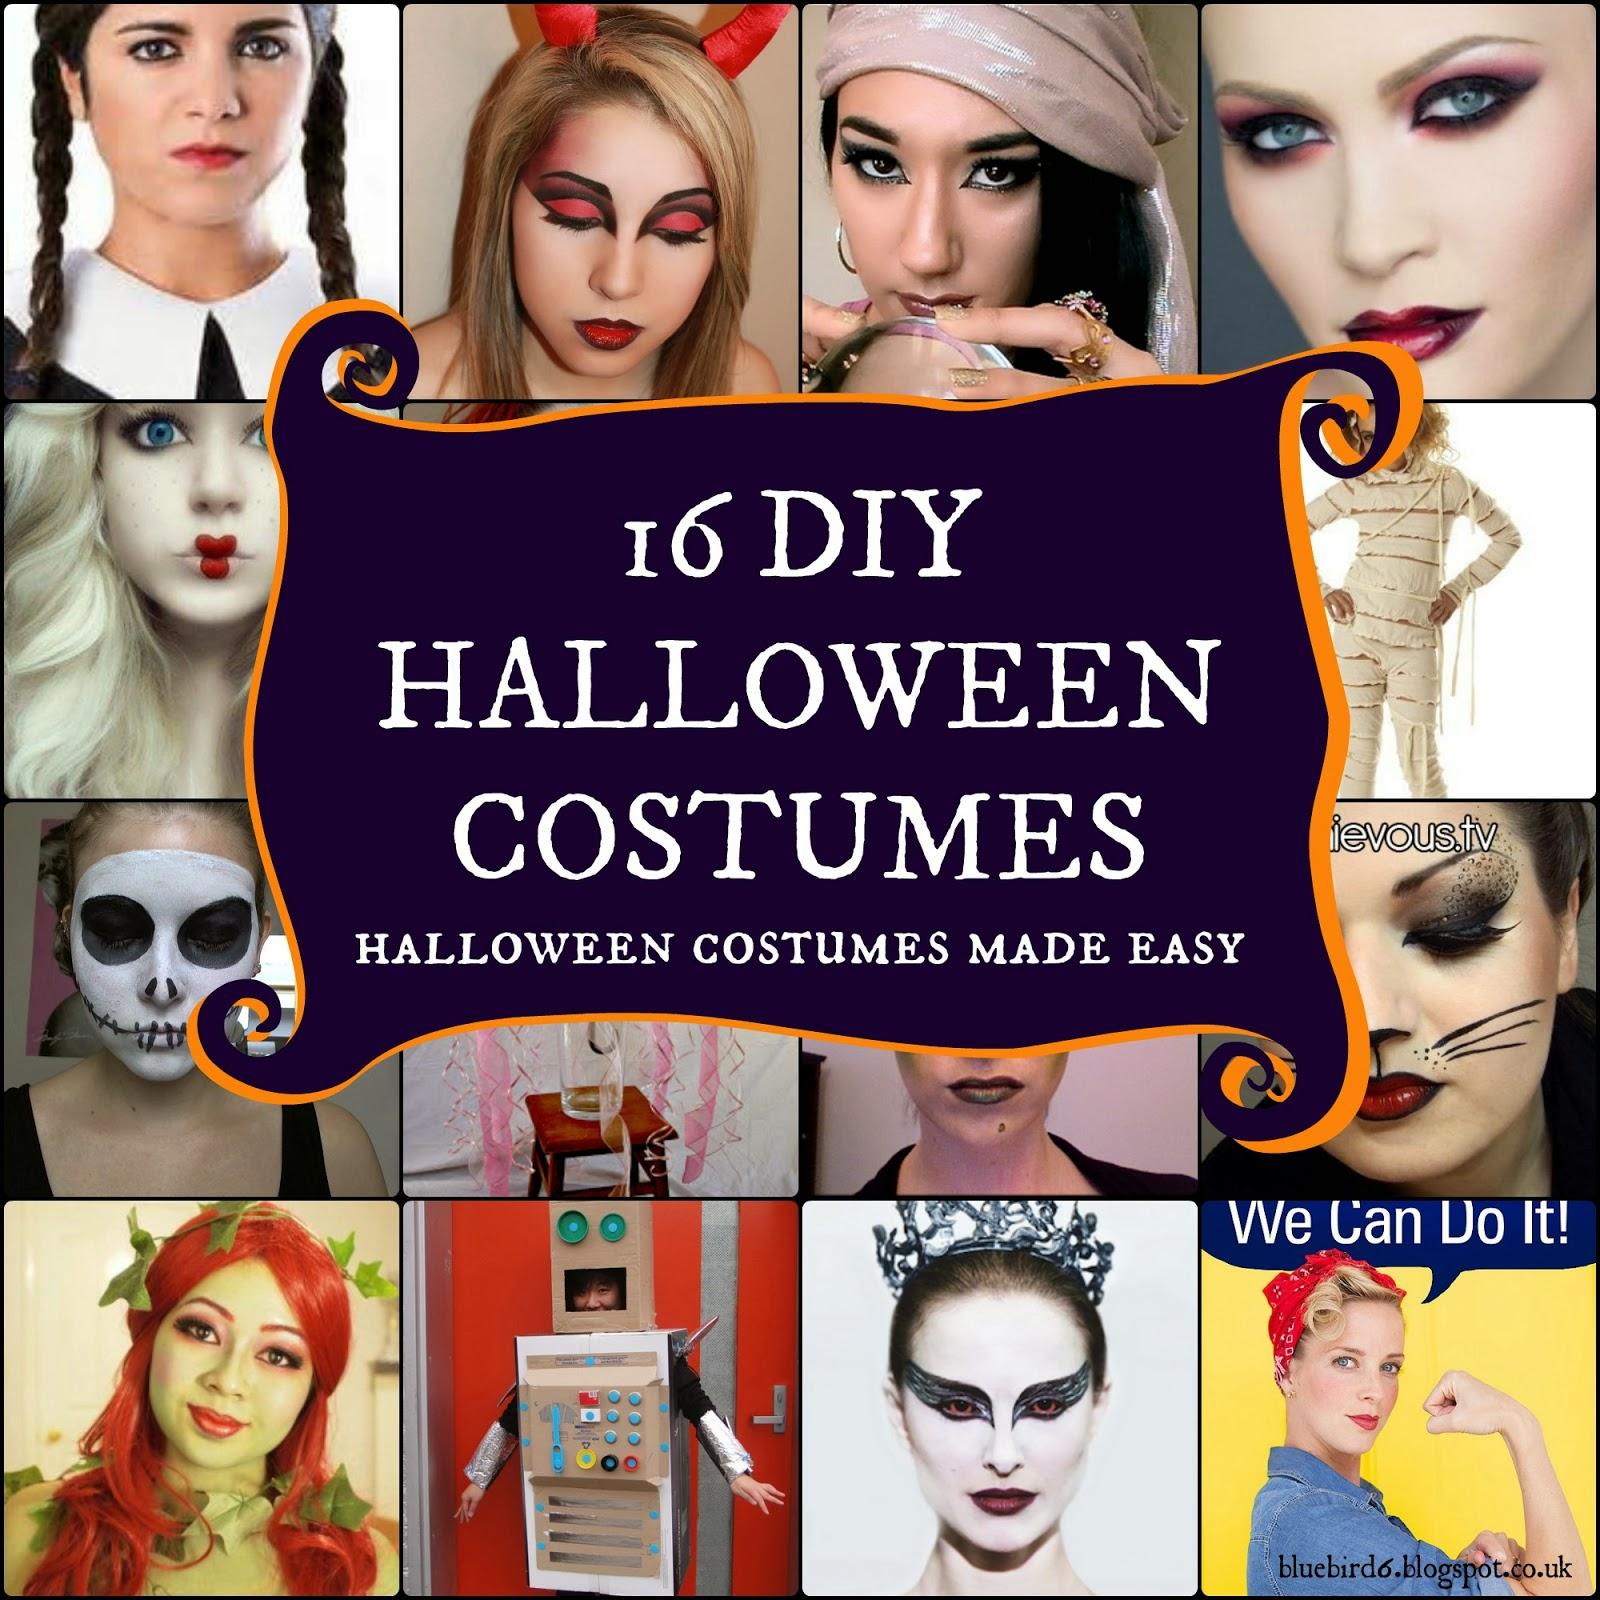 Easy diy halloween costumes uk cartoonview halloween costumes easy diy claritin s solutioingenieria Image collections